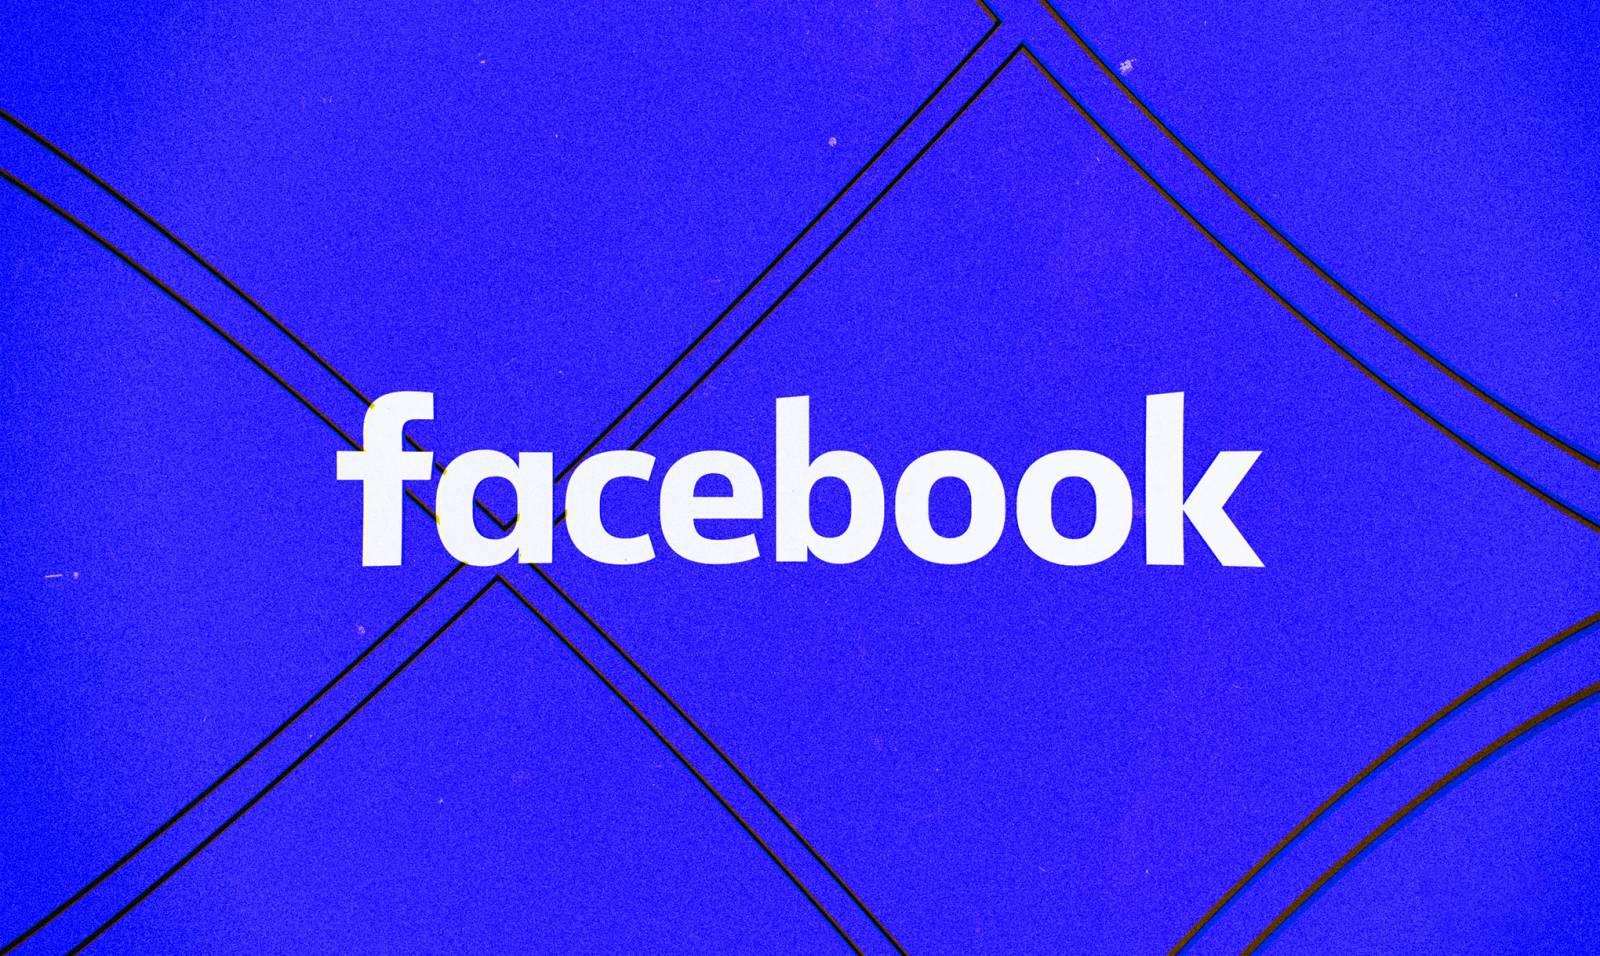 Facebook Noul Update Lansat Aplicatie Astazi